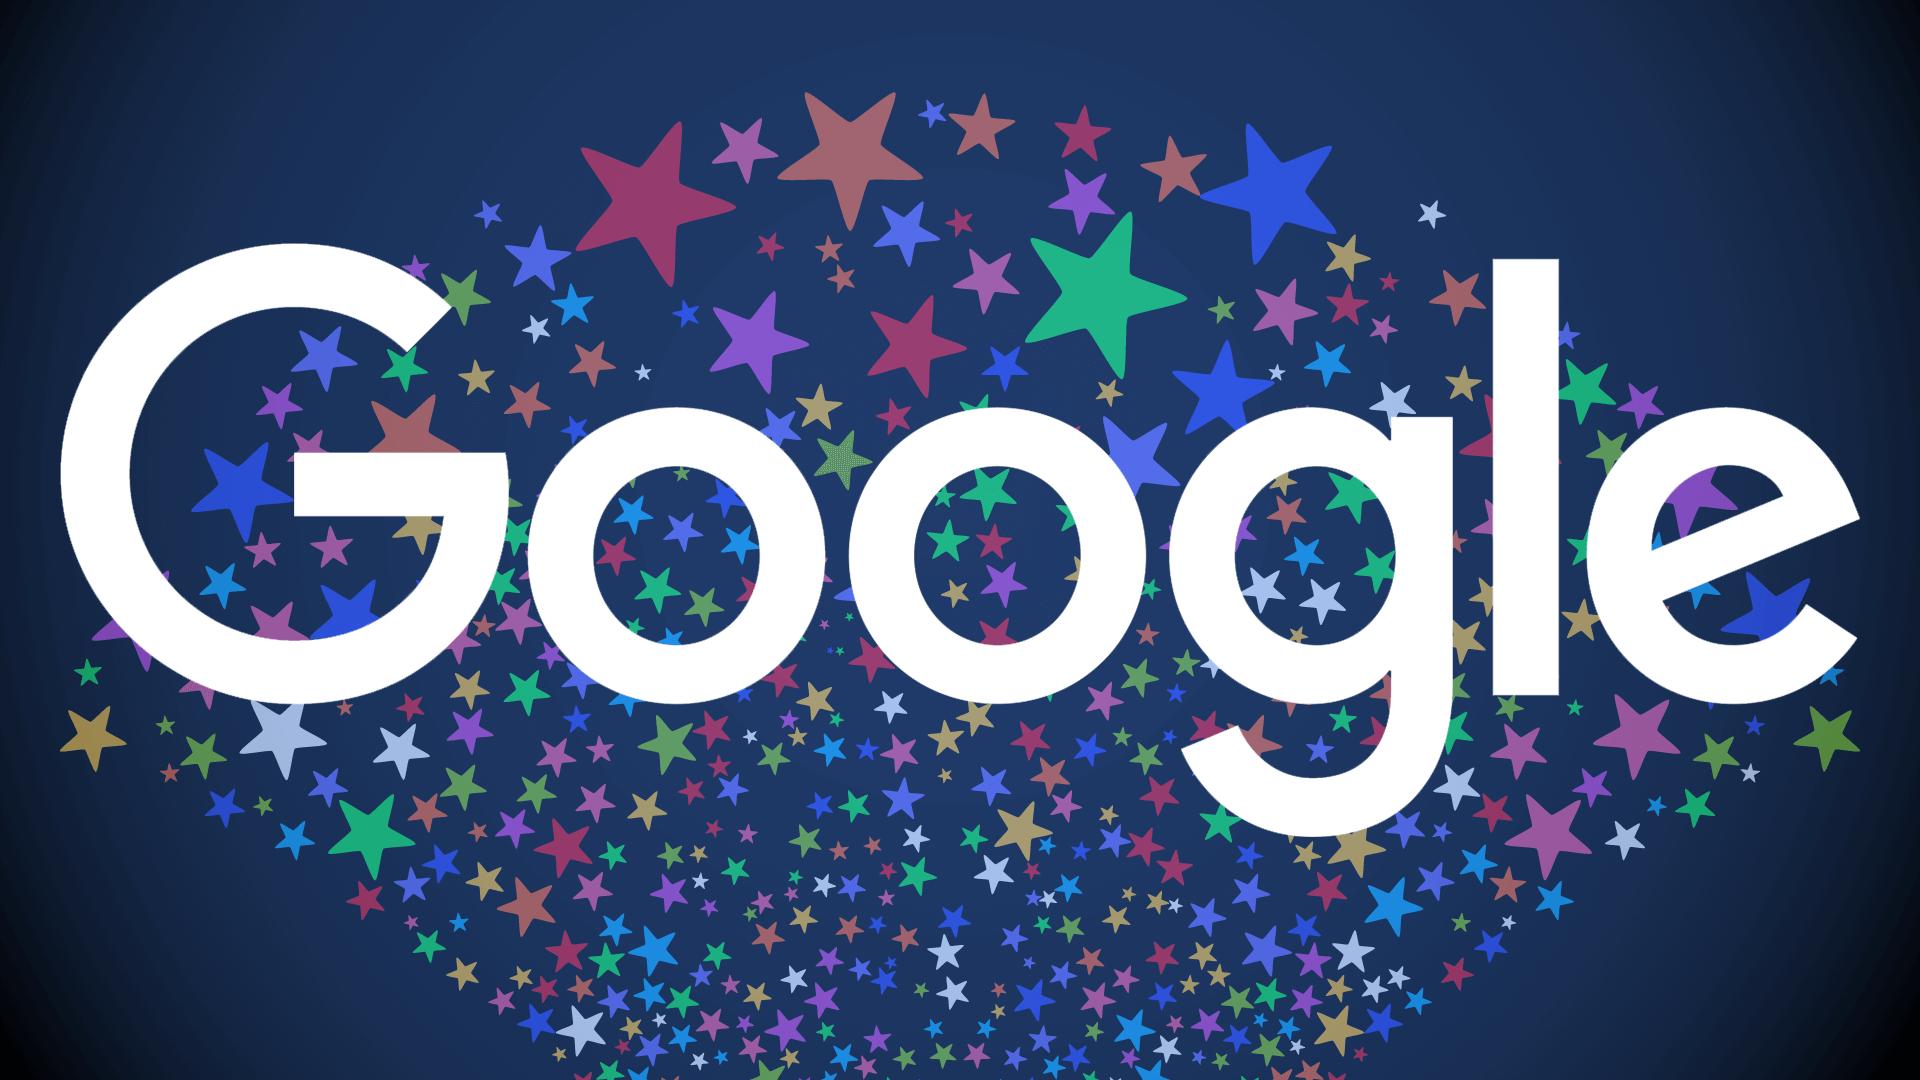 Google My Business agrega administración de revisión masiva